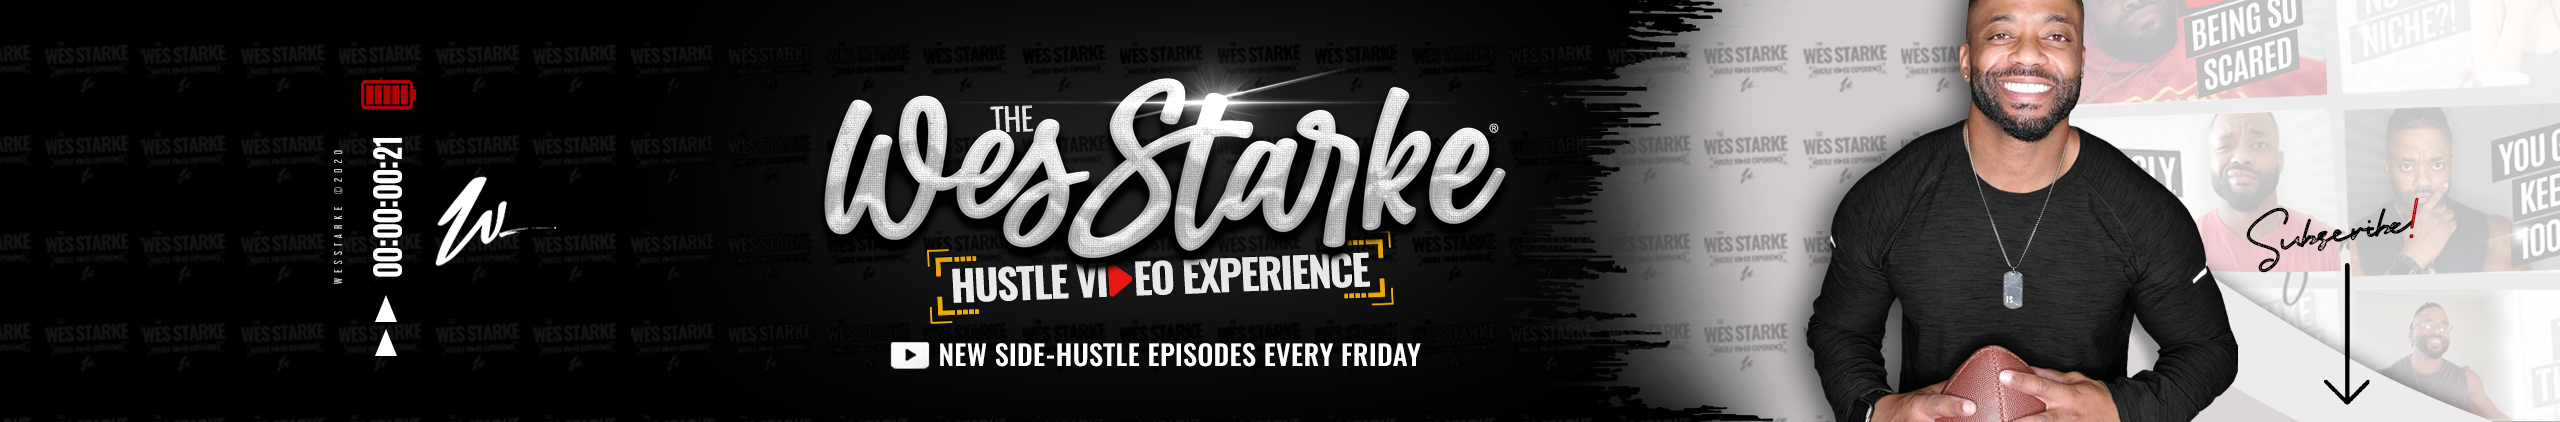 Wes Starke | Inspiring Hustlers